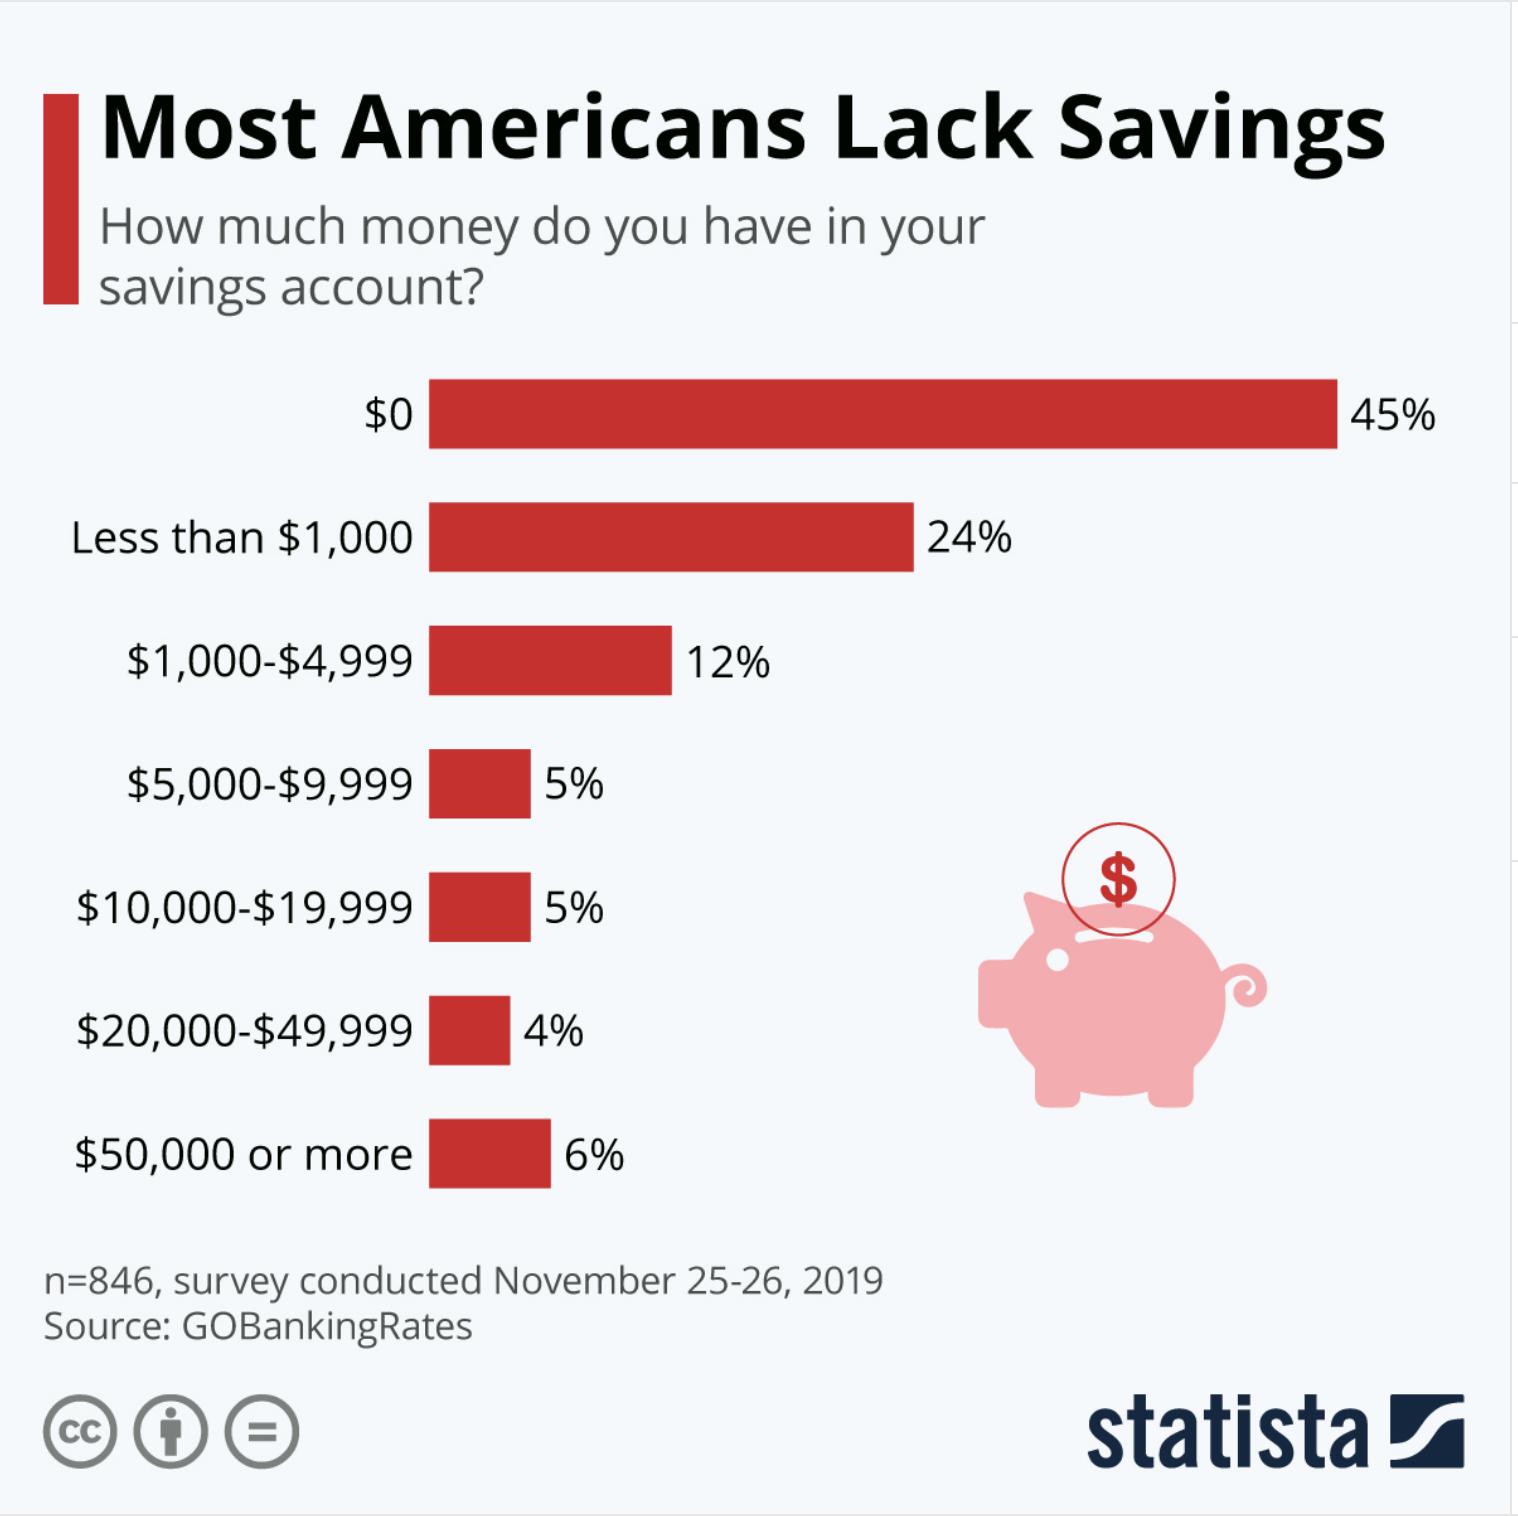 Most Americans Lack Savings